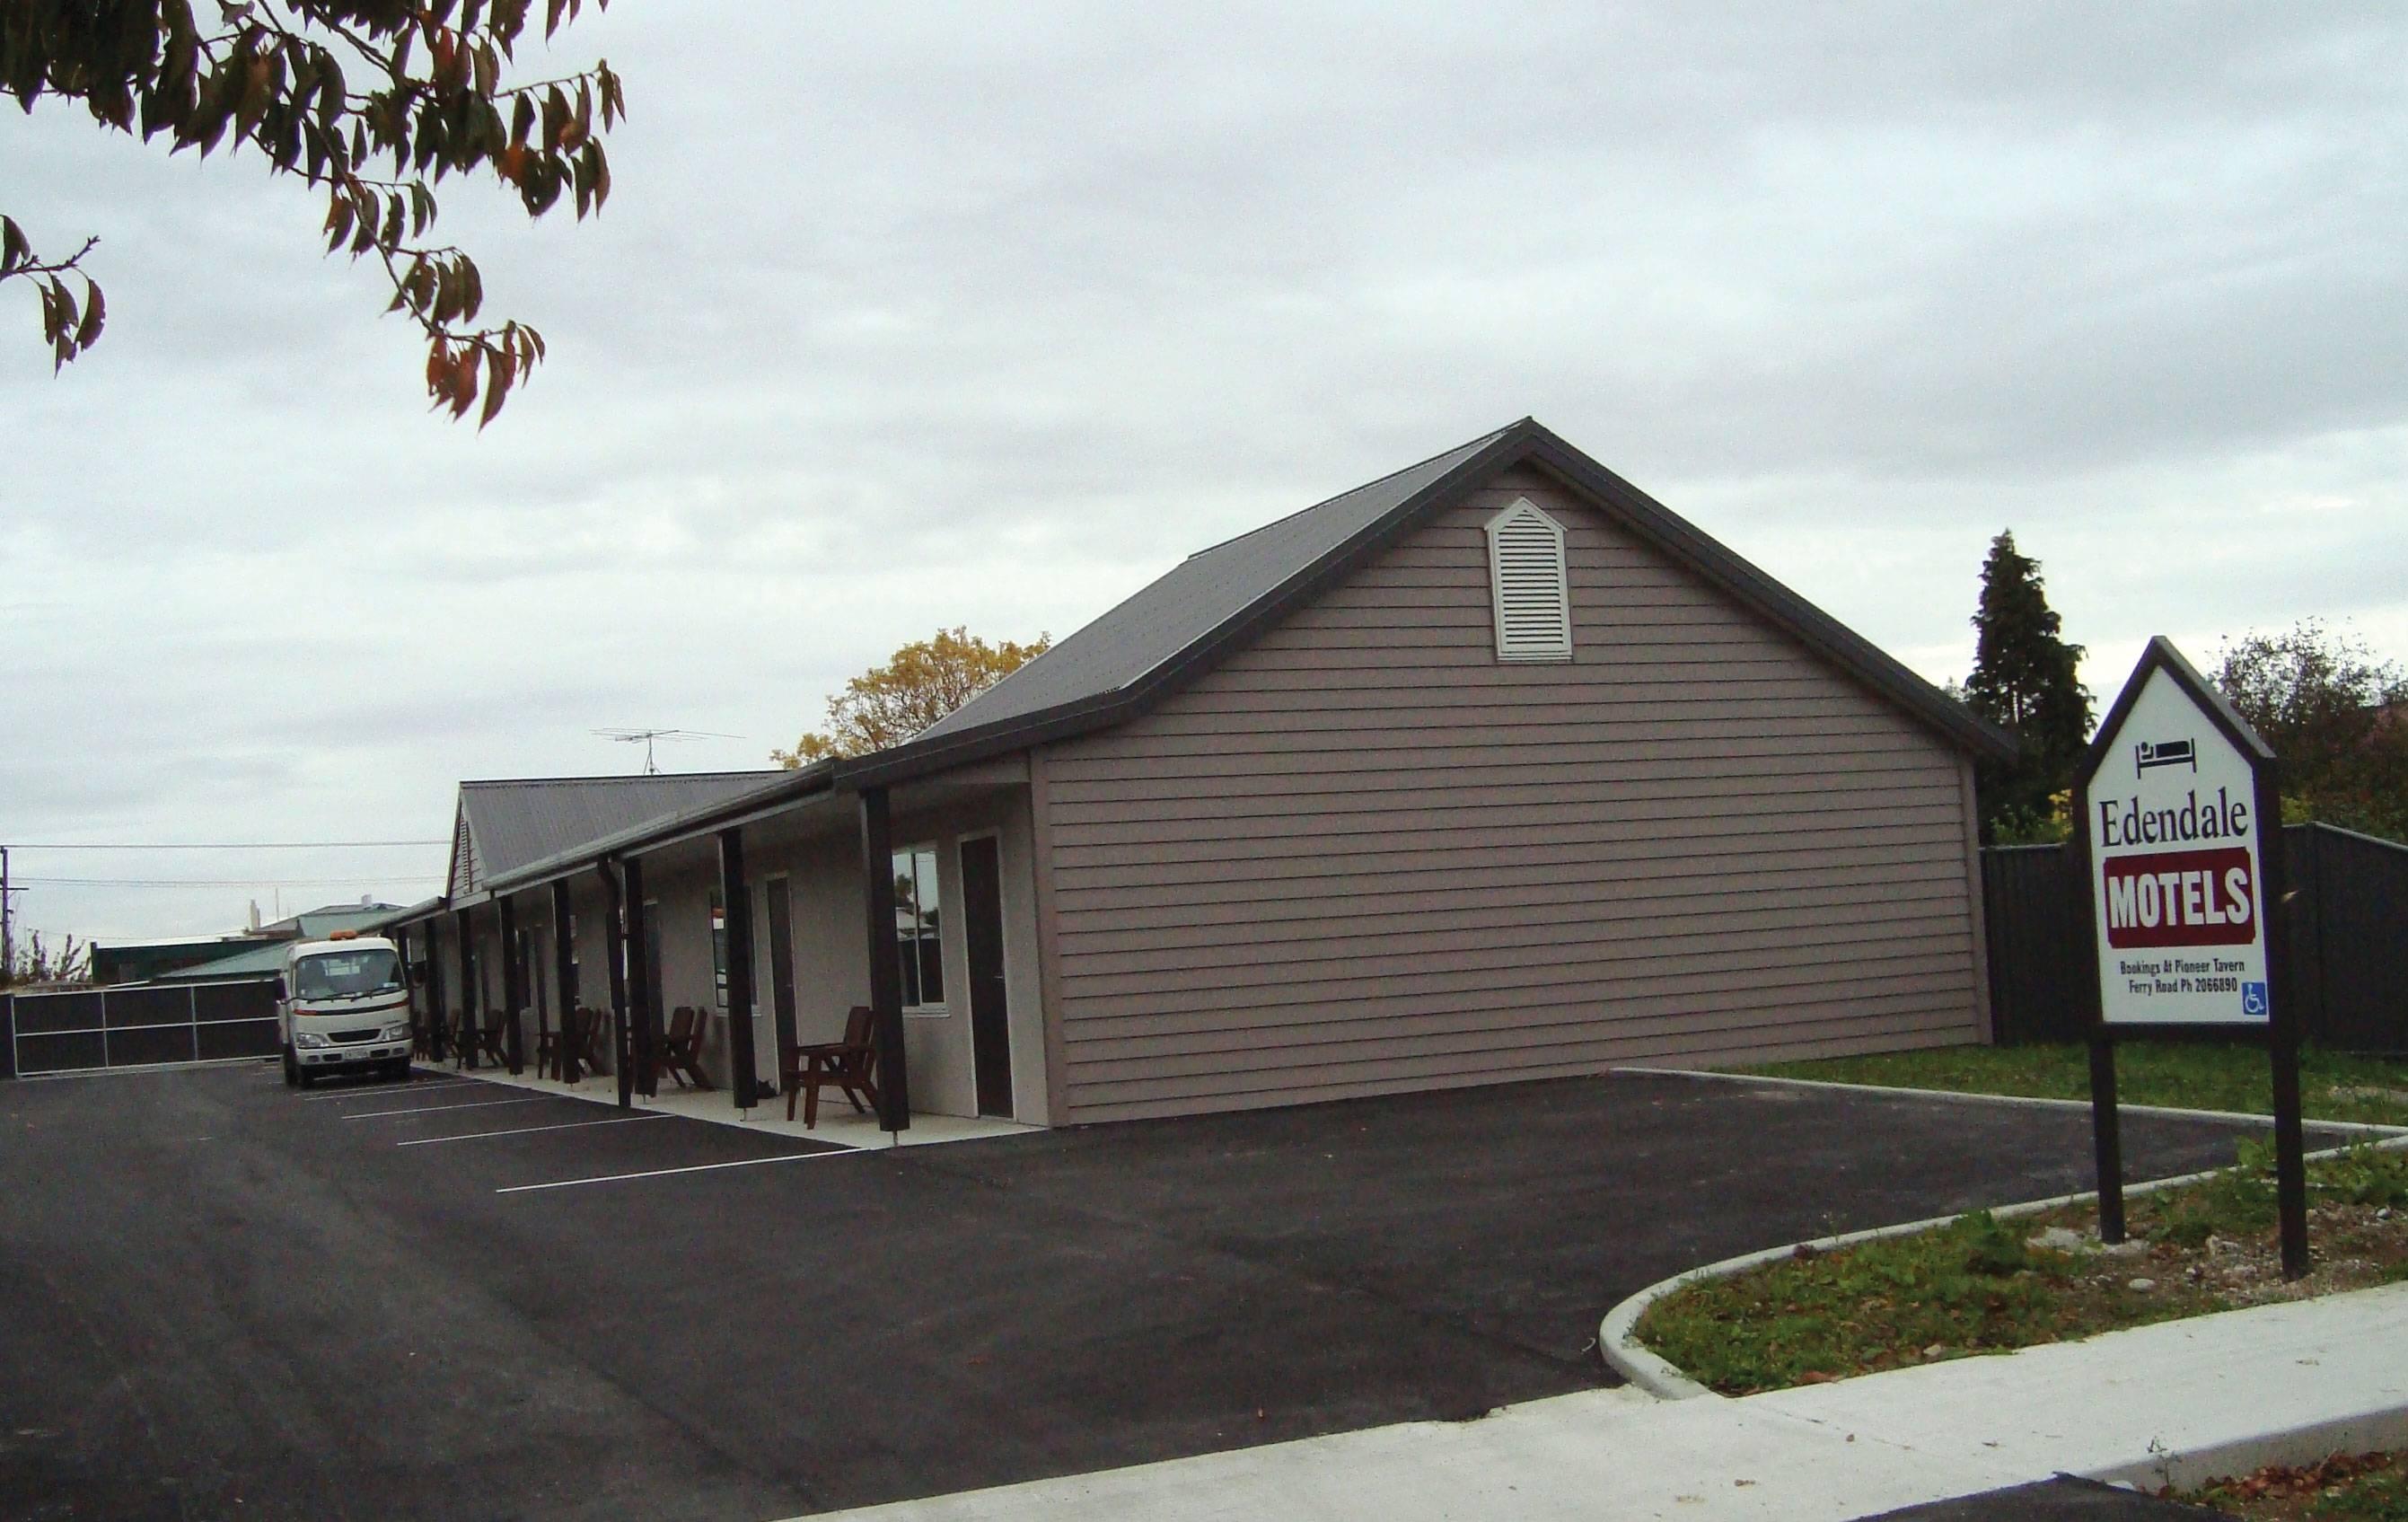 Edendale Motel